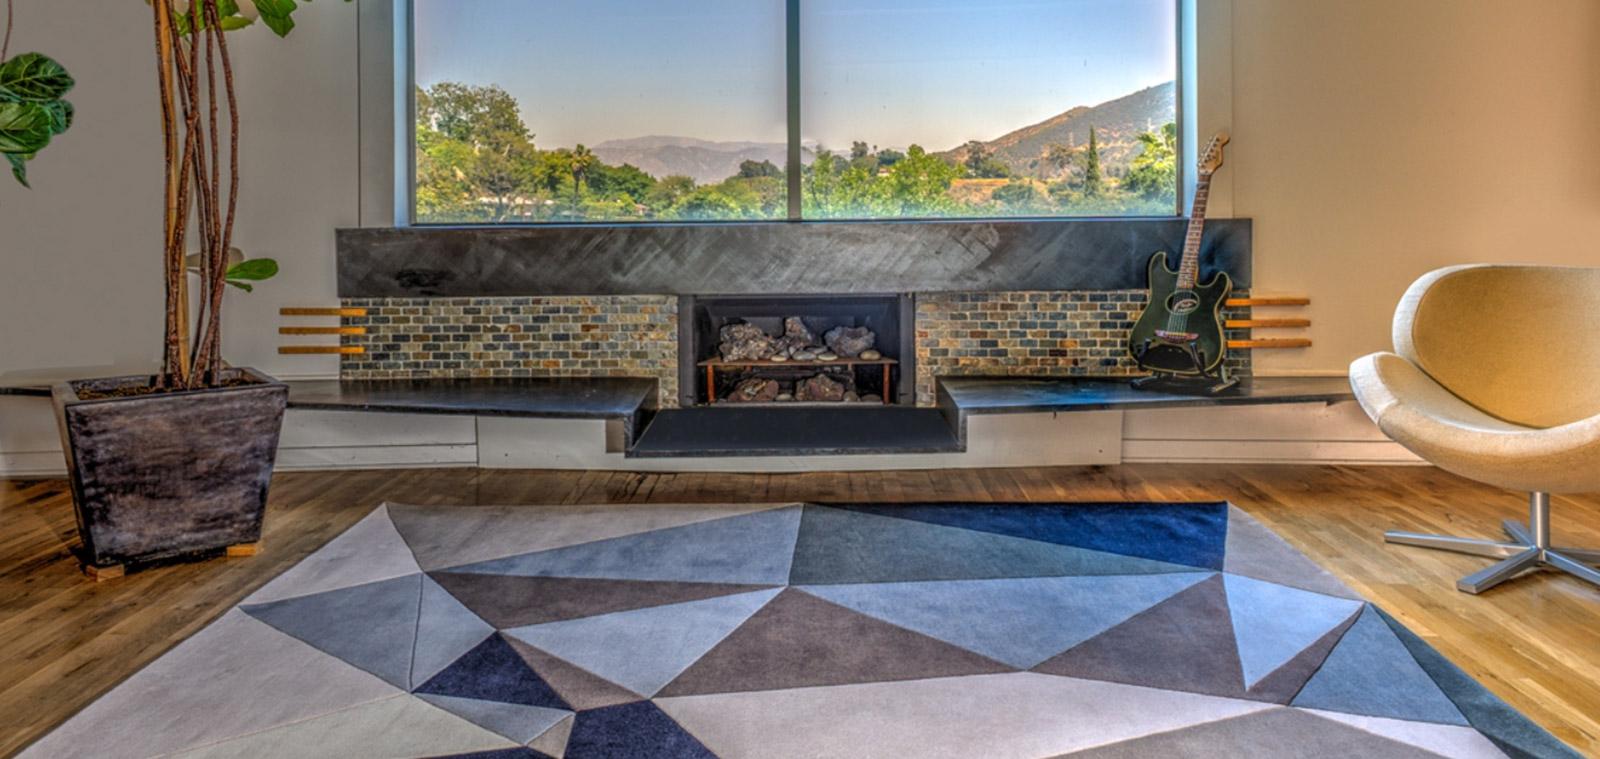 Korgamy Collection Colorful Geometric Rugs By Karim Rashid Perfect For Modern Homes